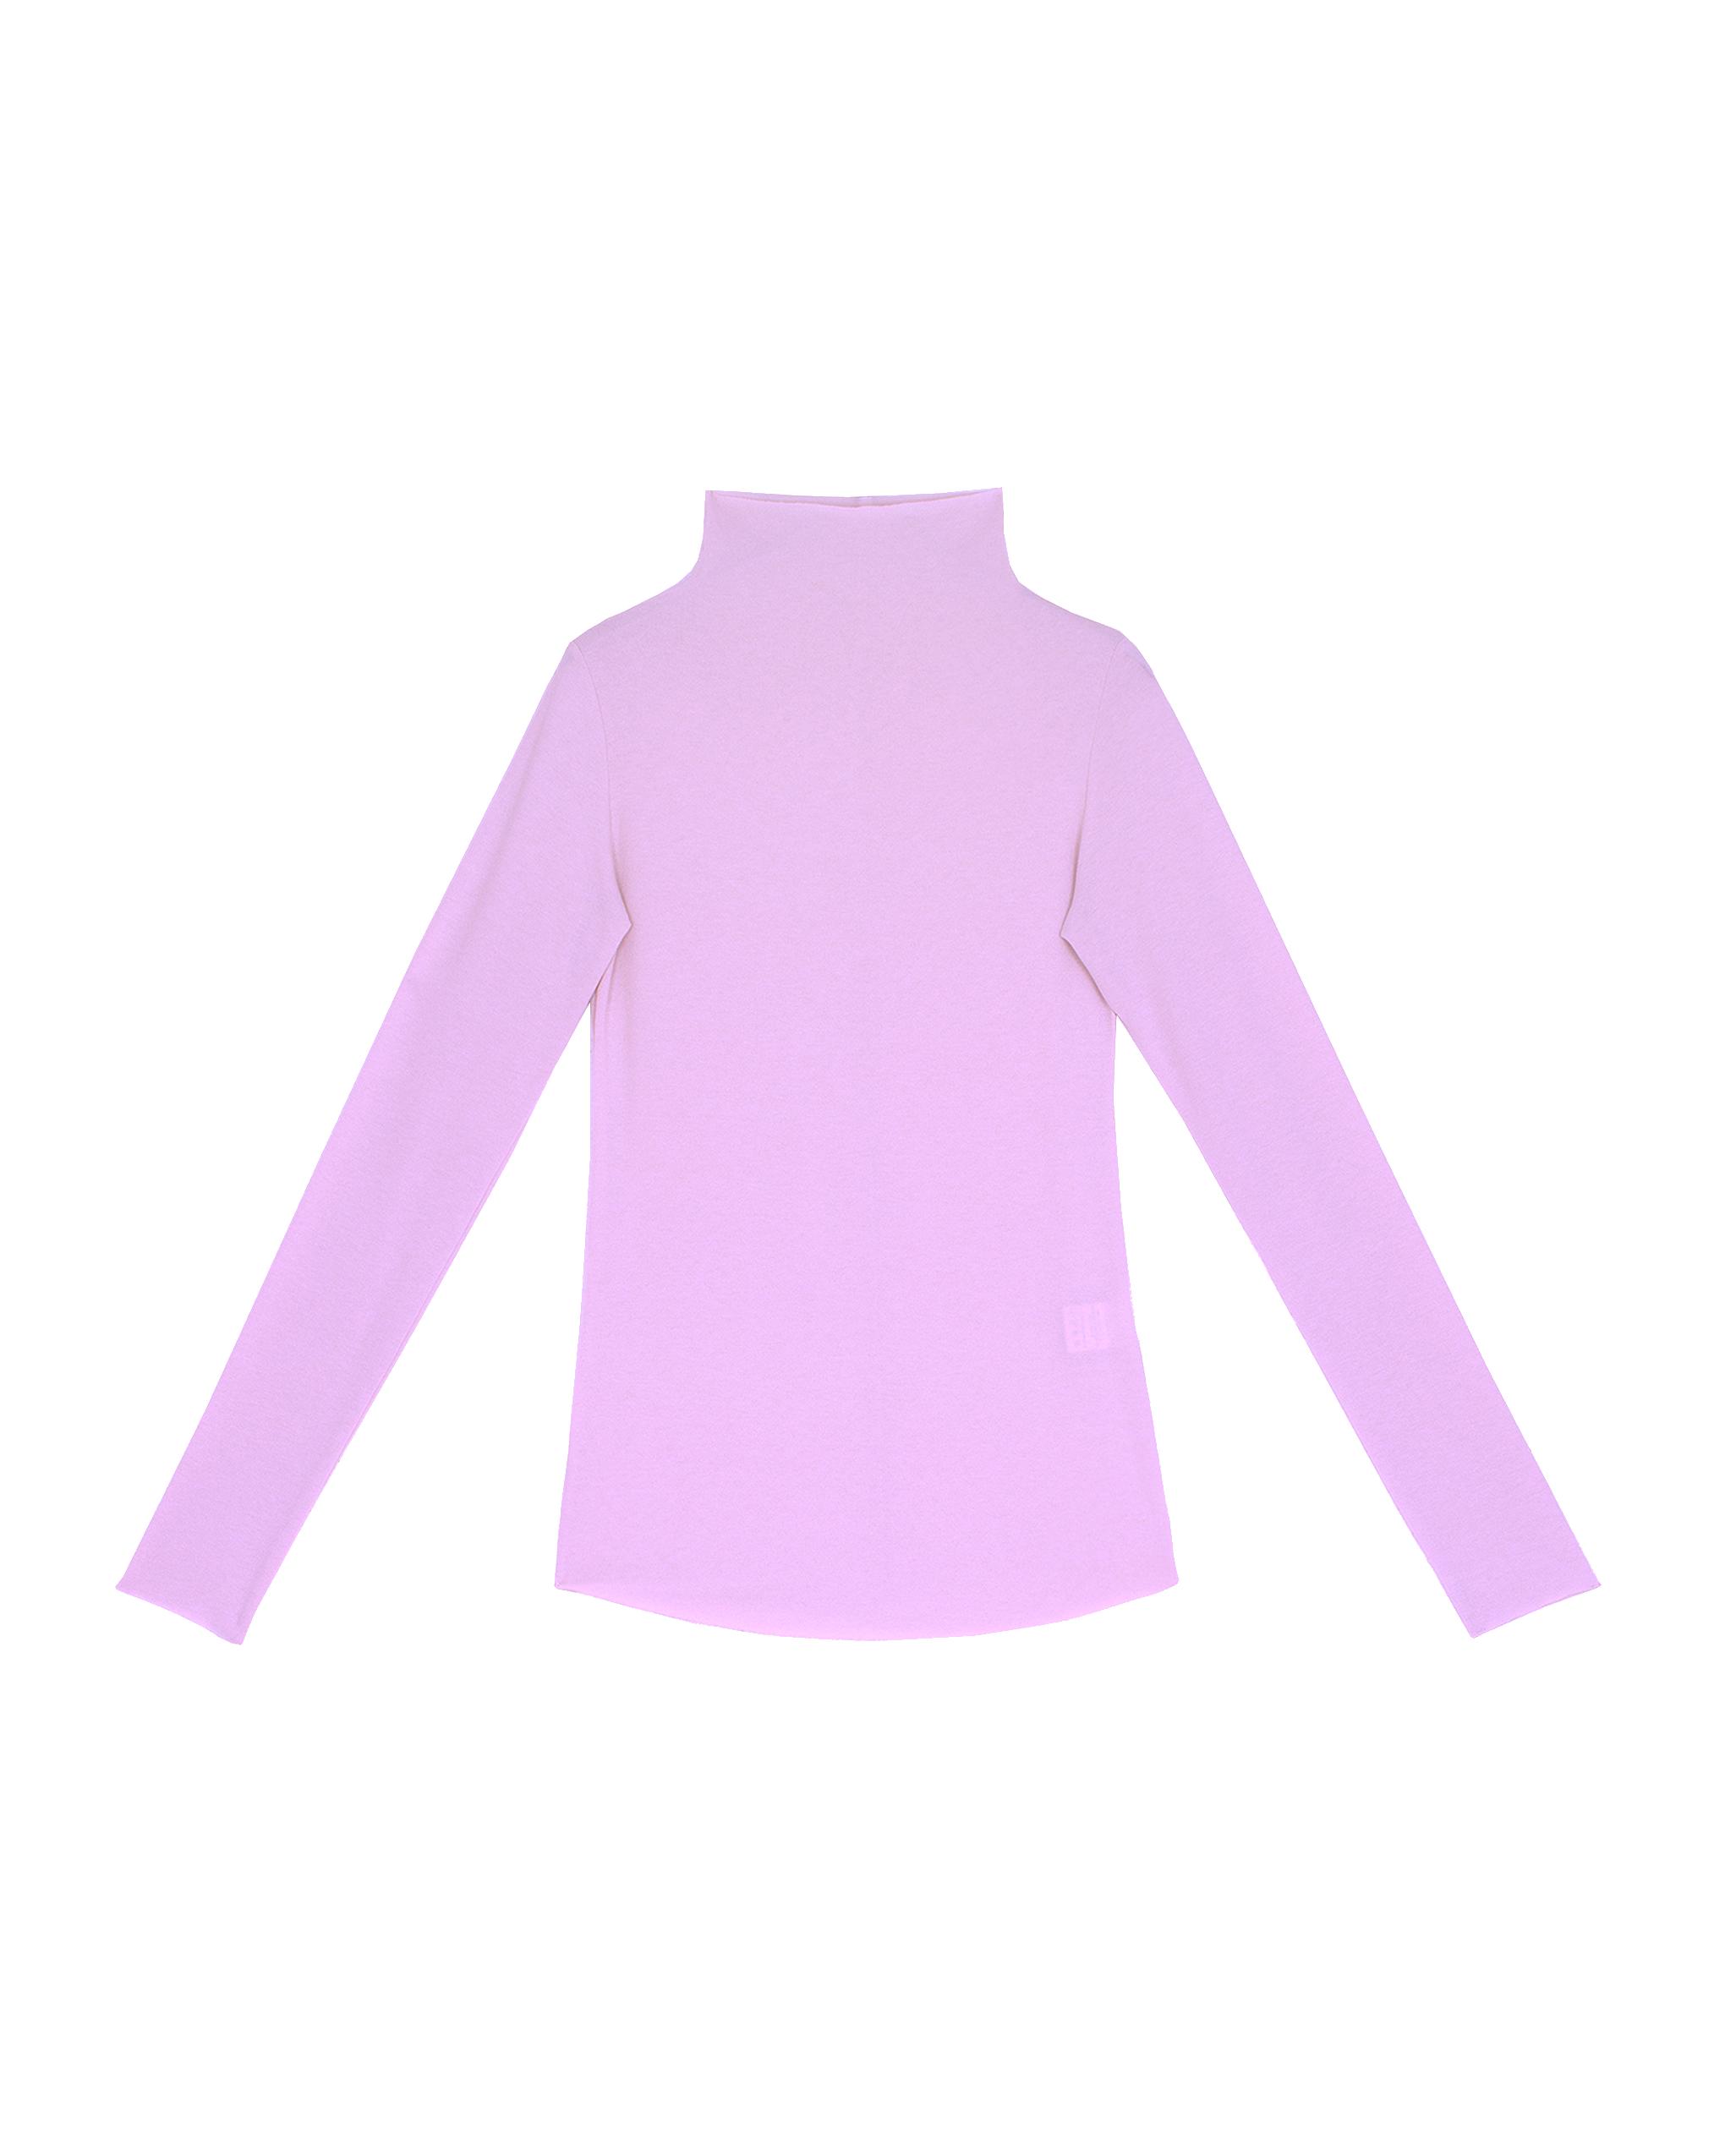 EMIN + PAUL violet second skin wool blouse.